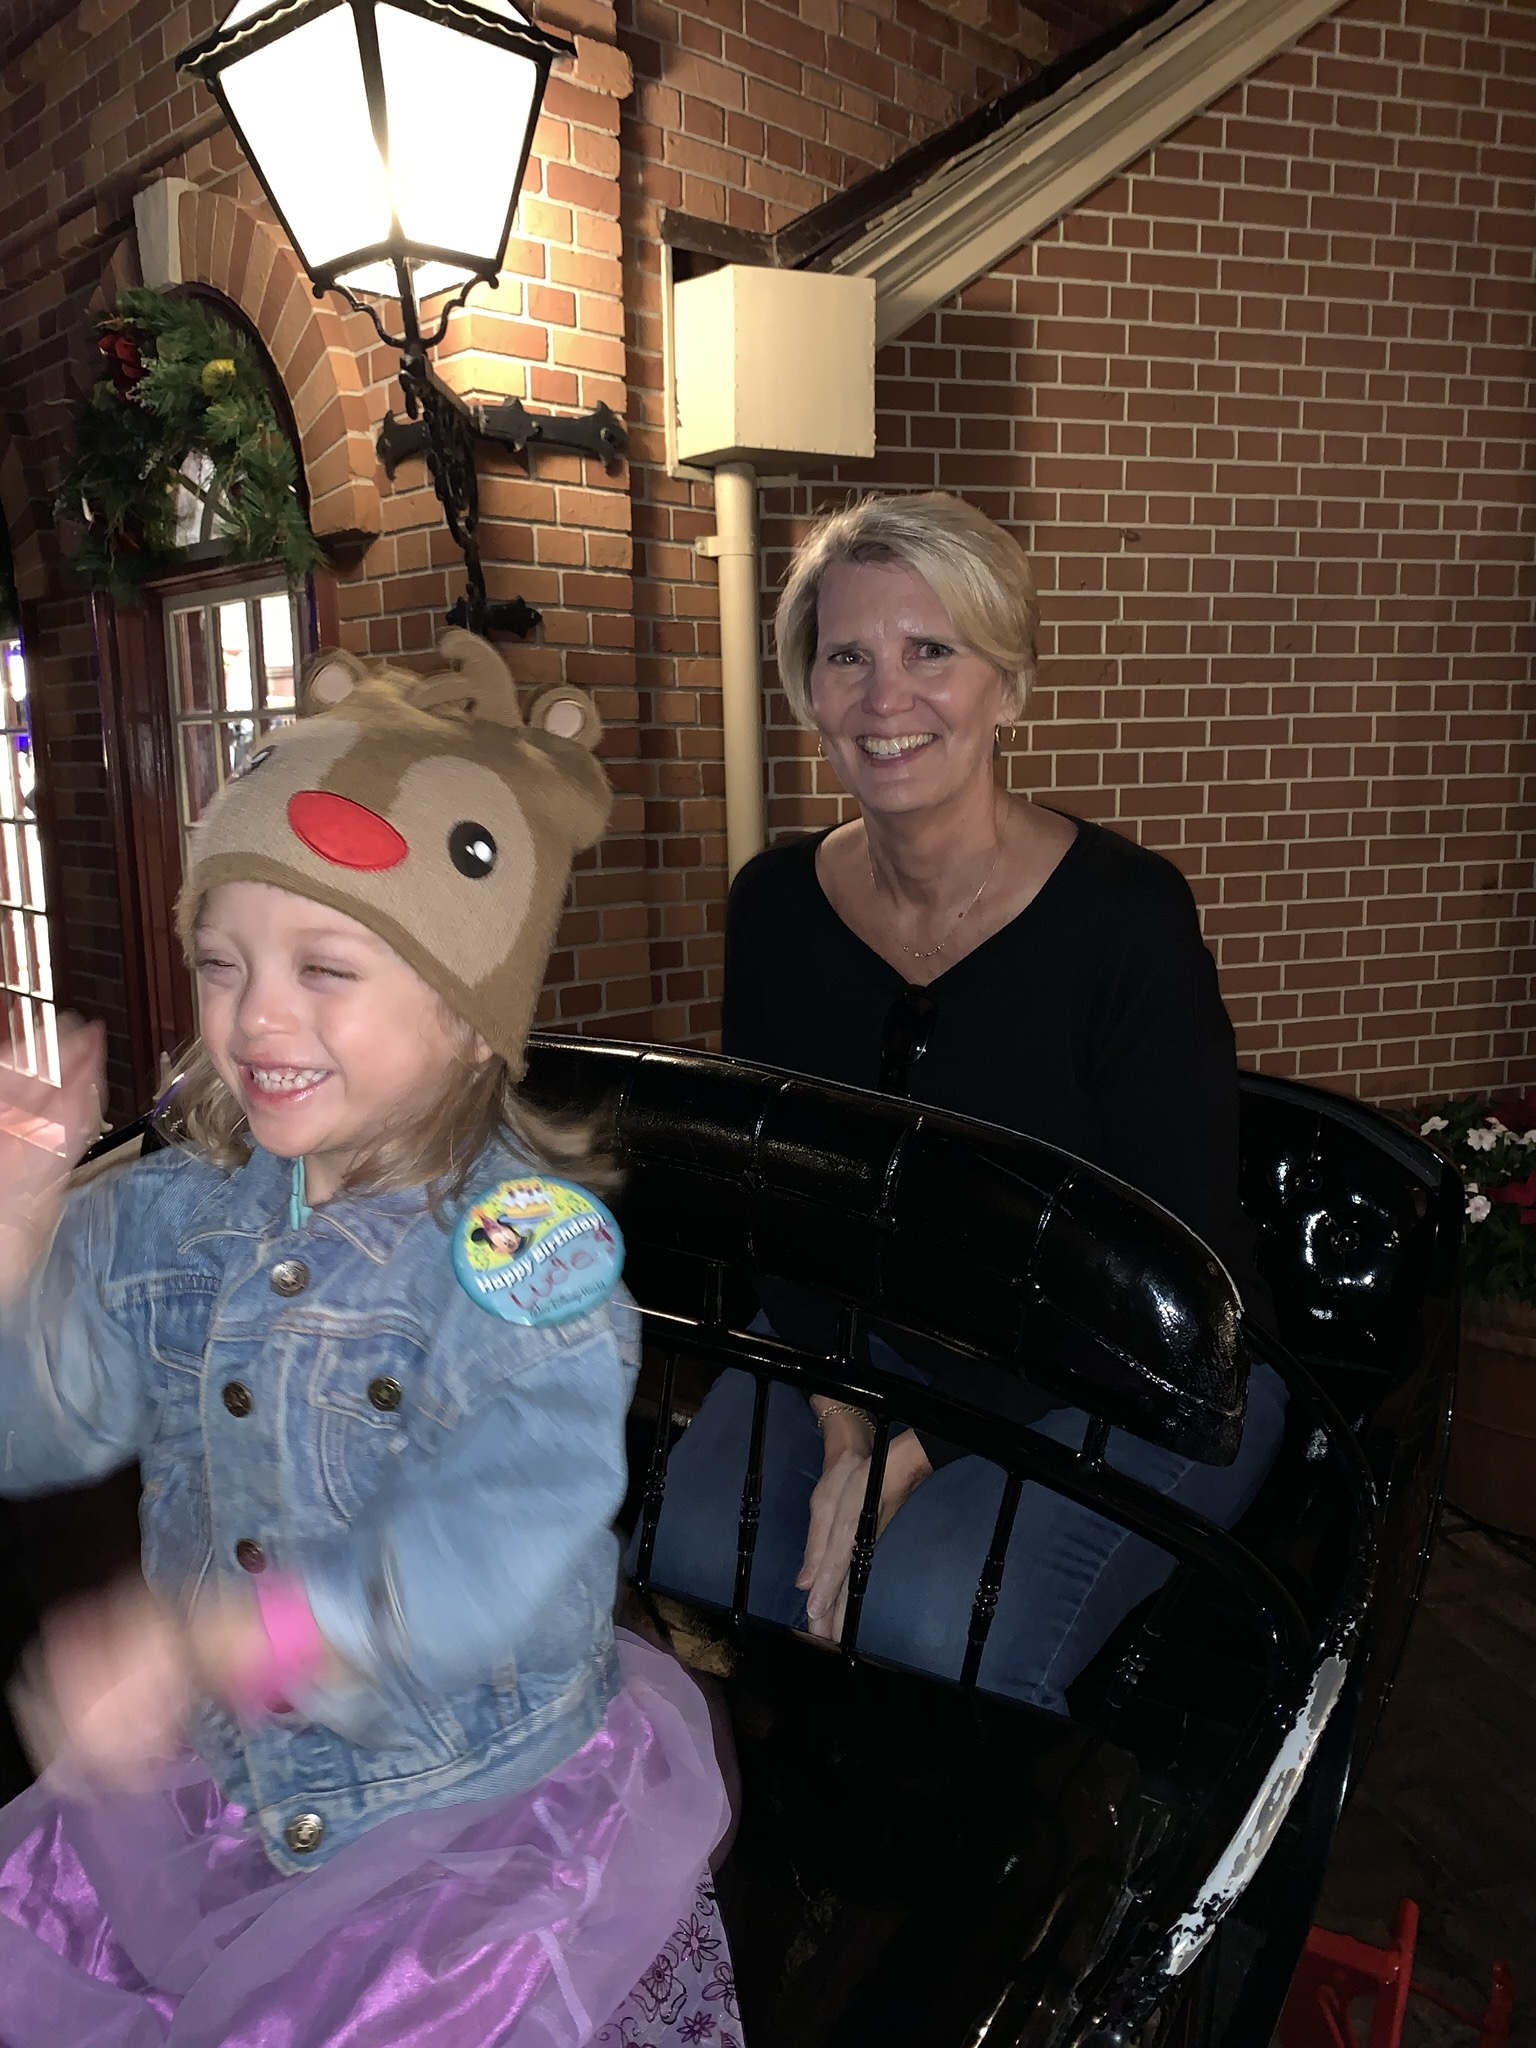 Sleigh Ride with grandma outside of the Christmas shop.